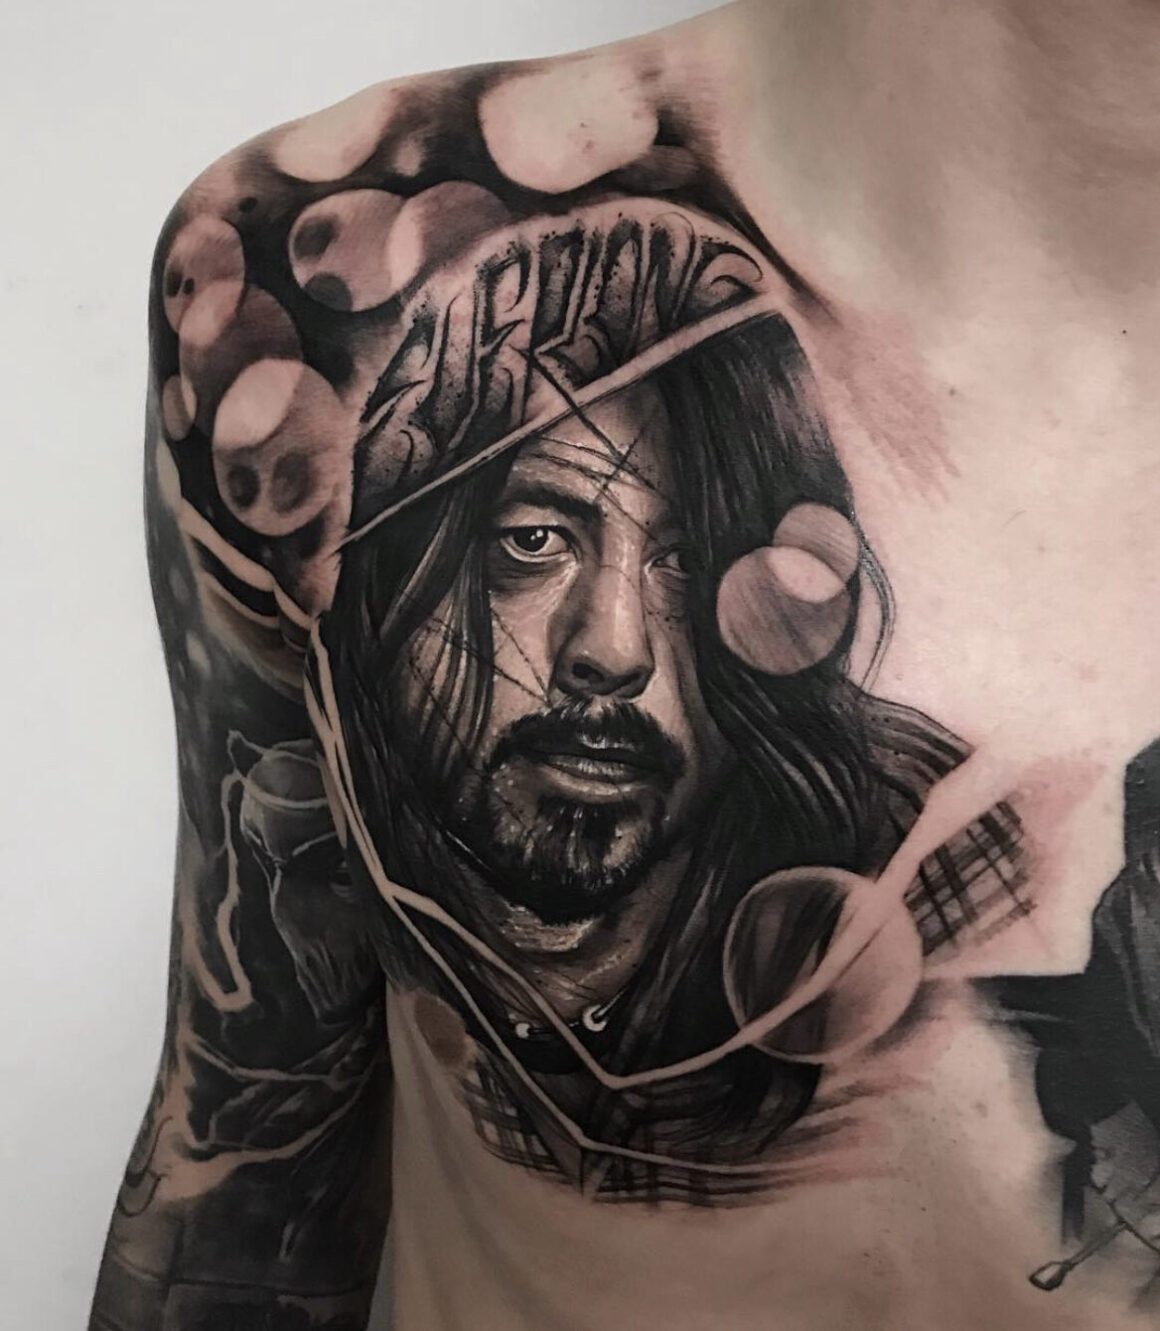 Anrijs Straume, Bold as Brass Tattoo Company, Liverpool, UK